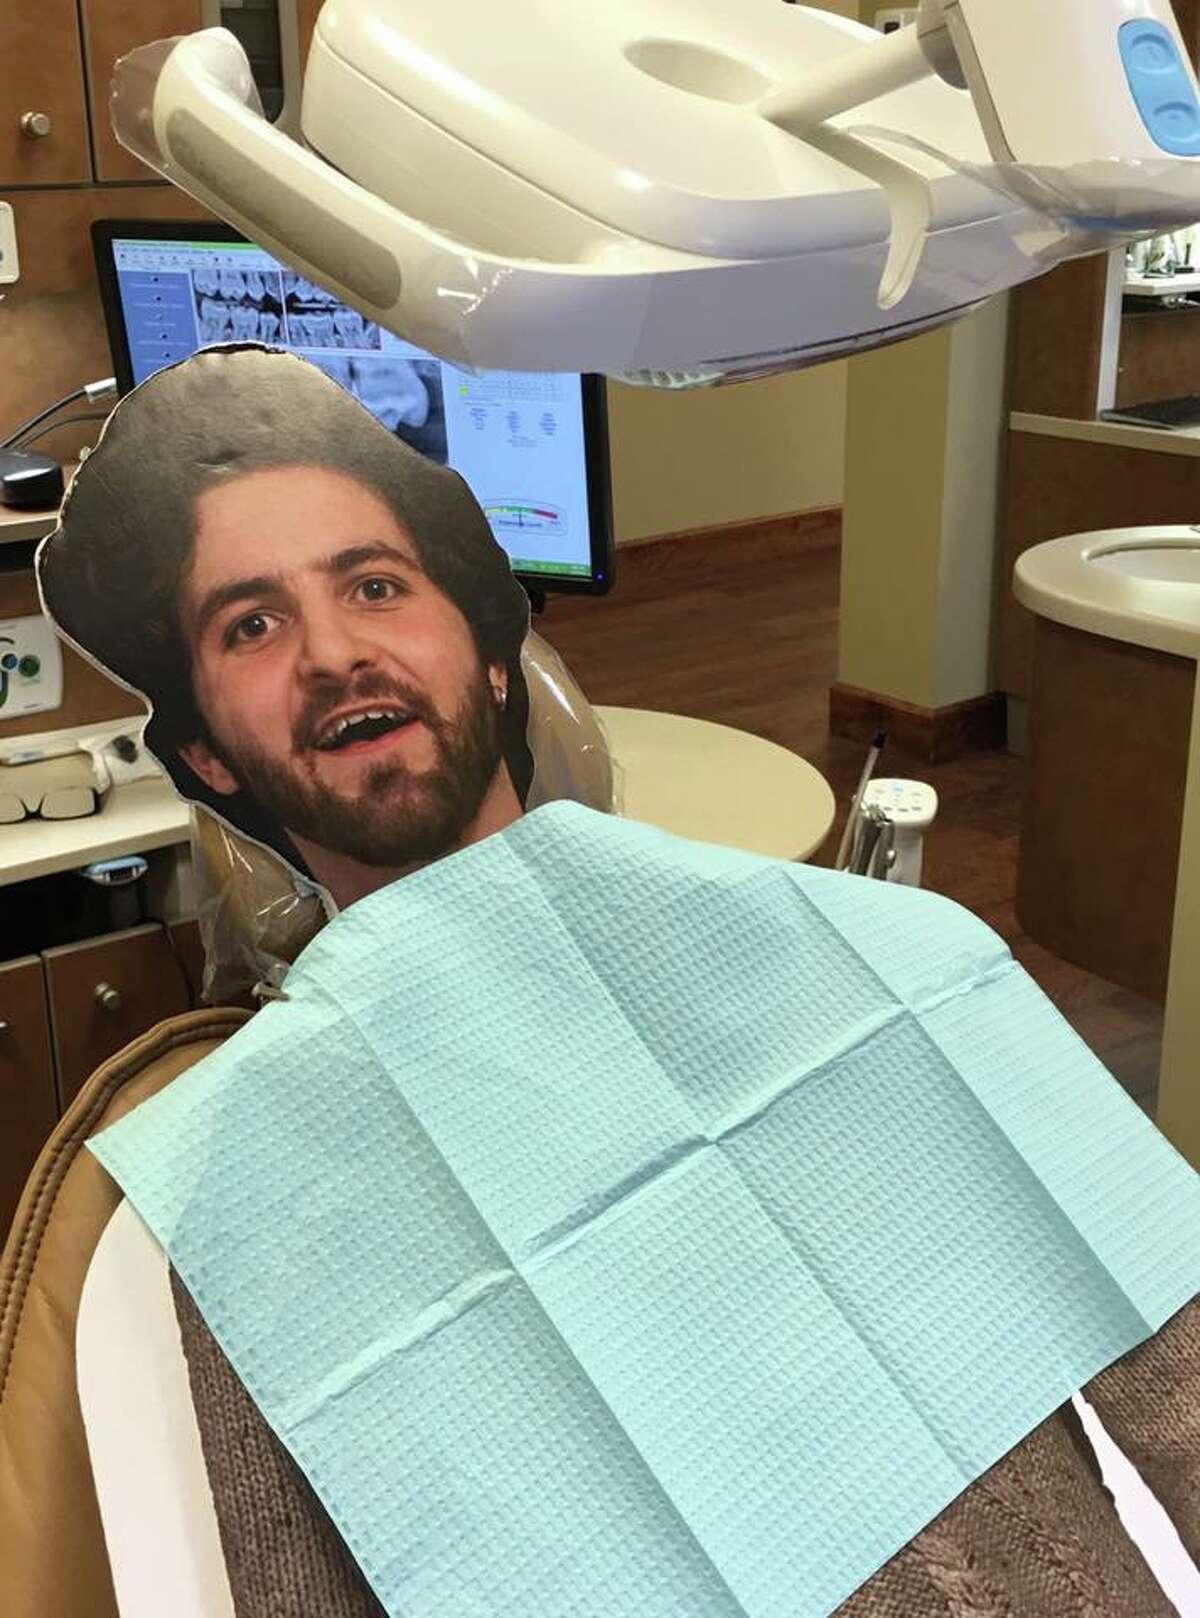 Flat Dalton at the dentist.